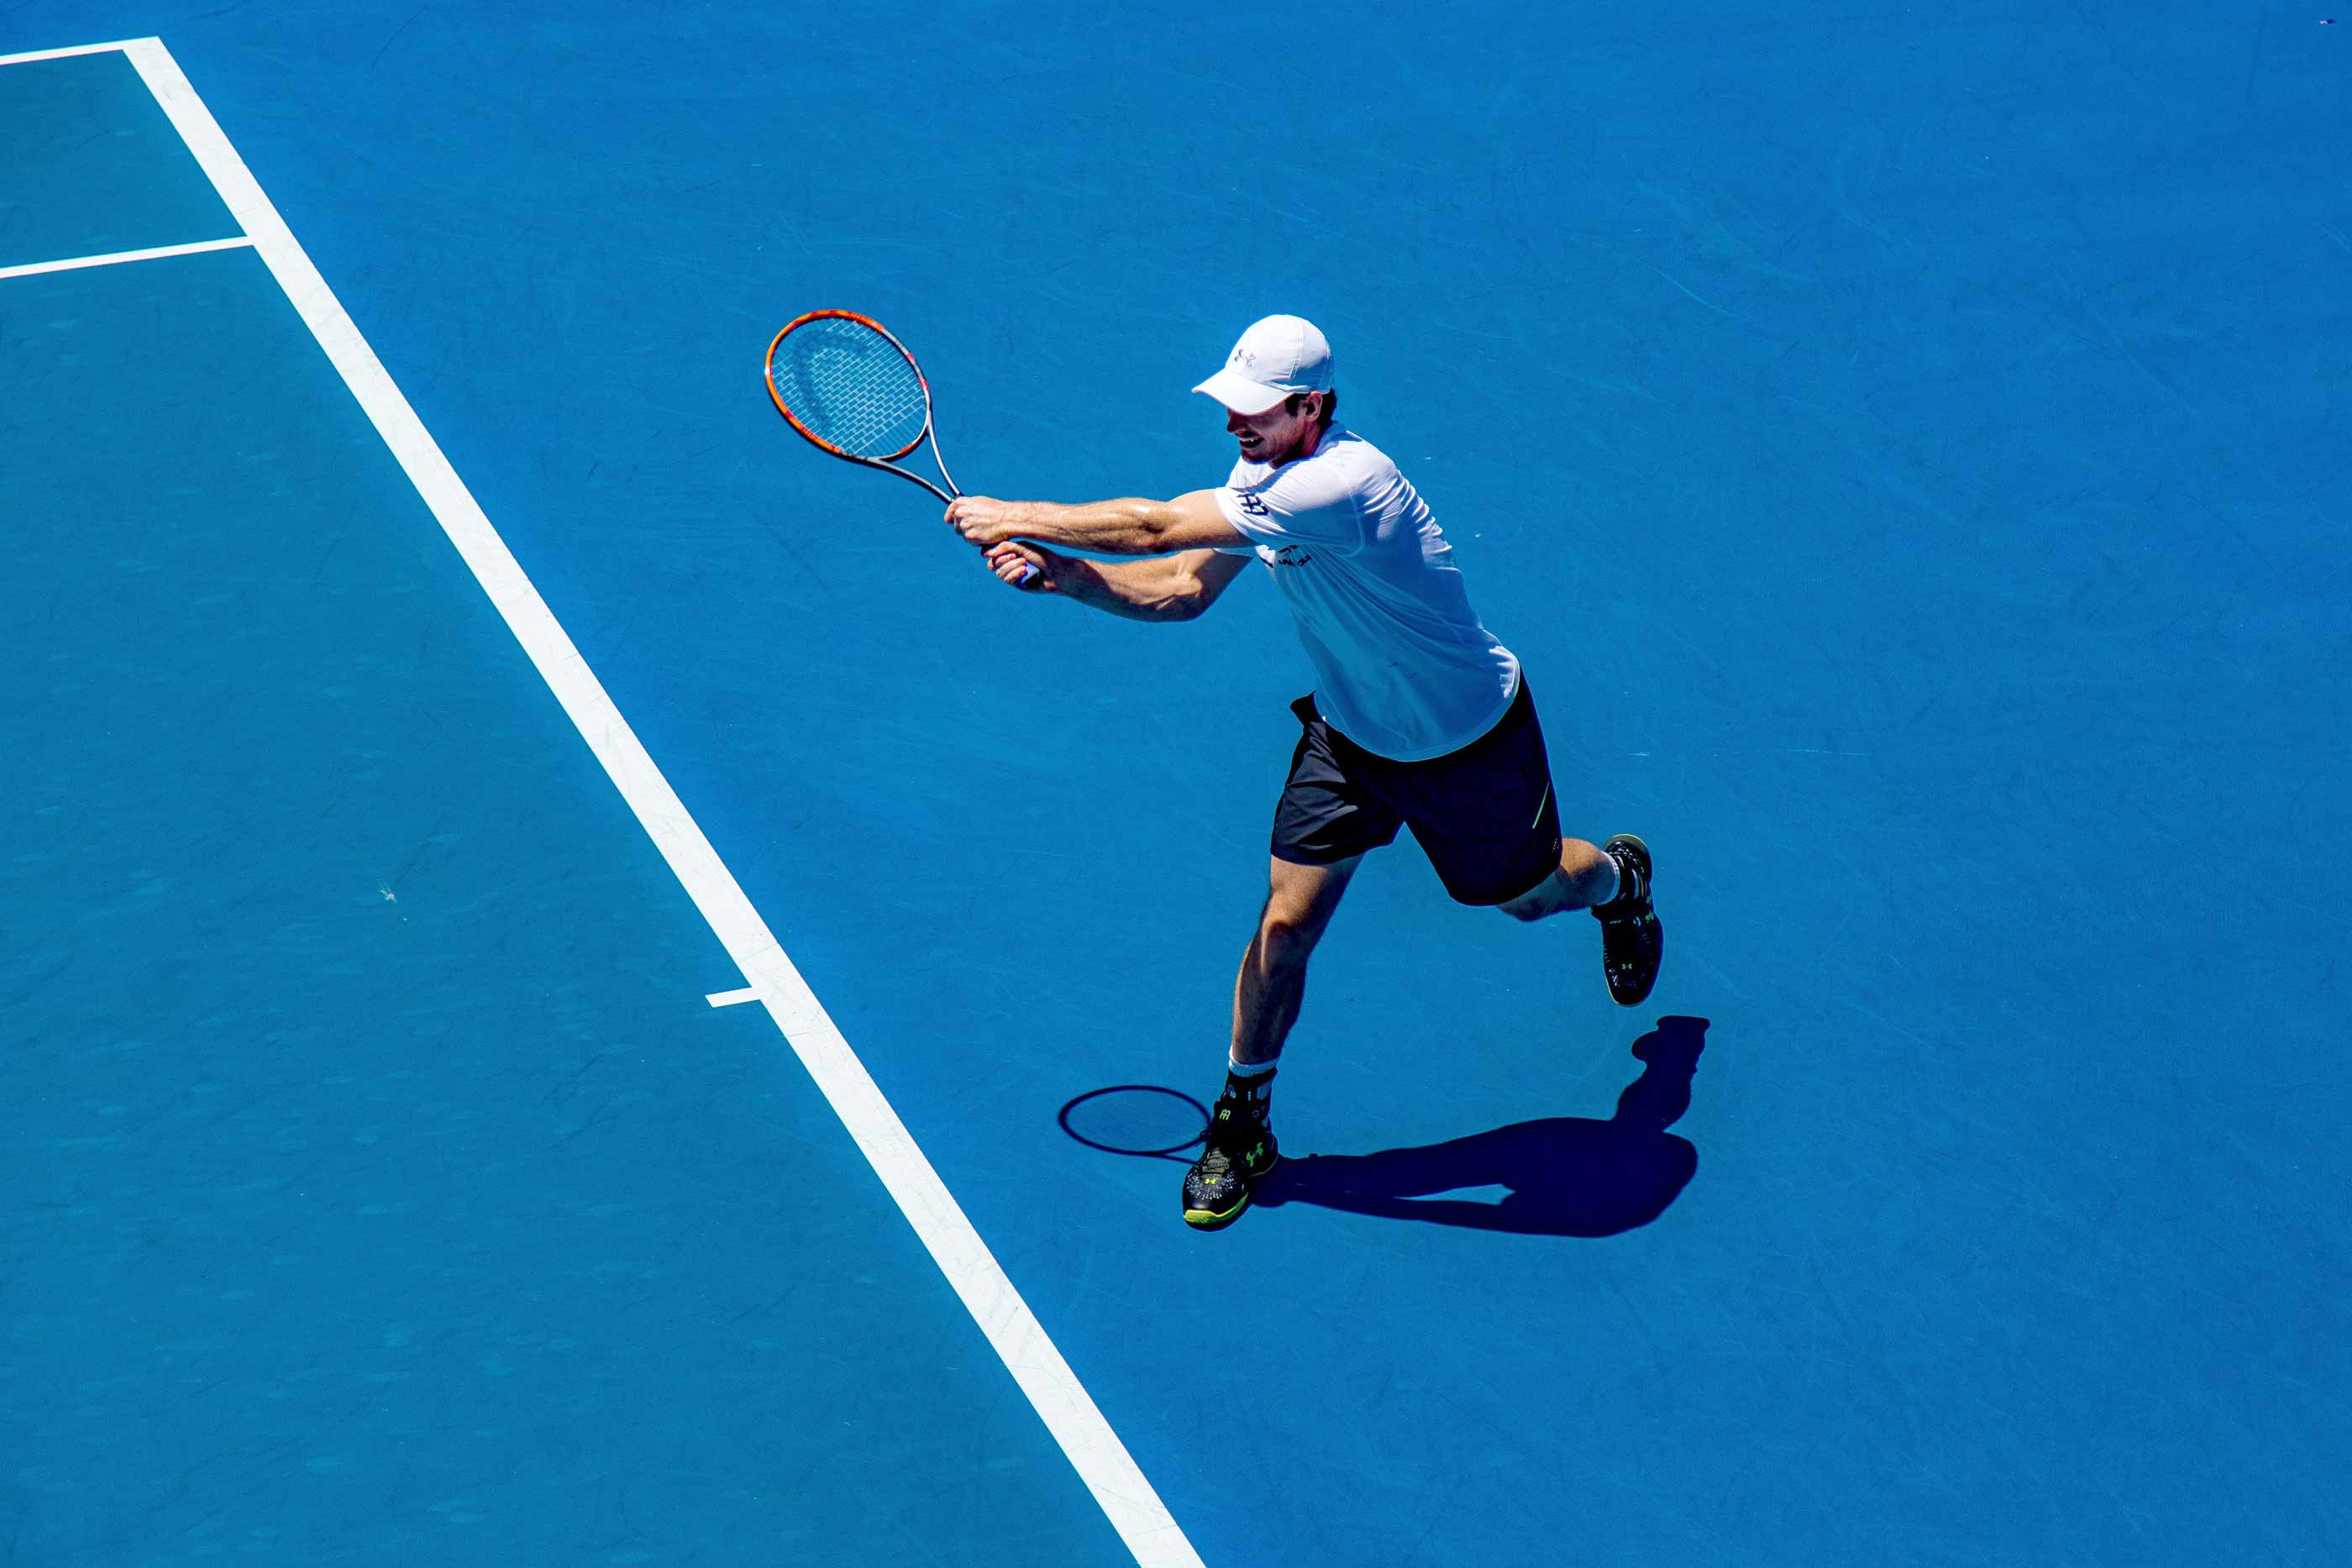 Rapaz a jogar ténis